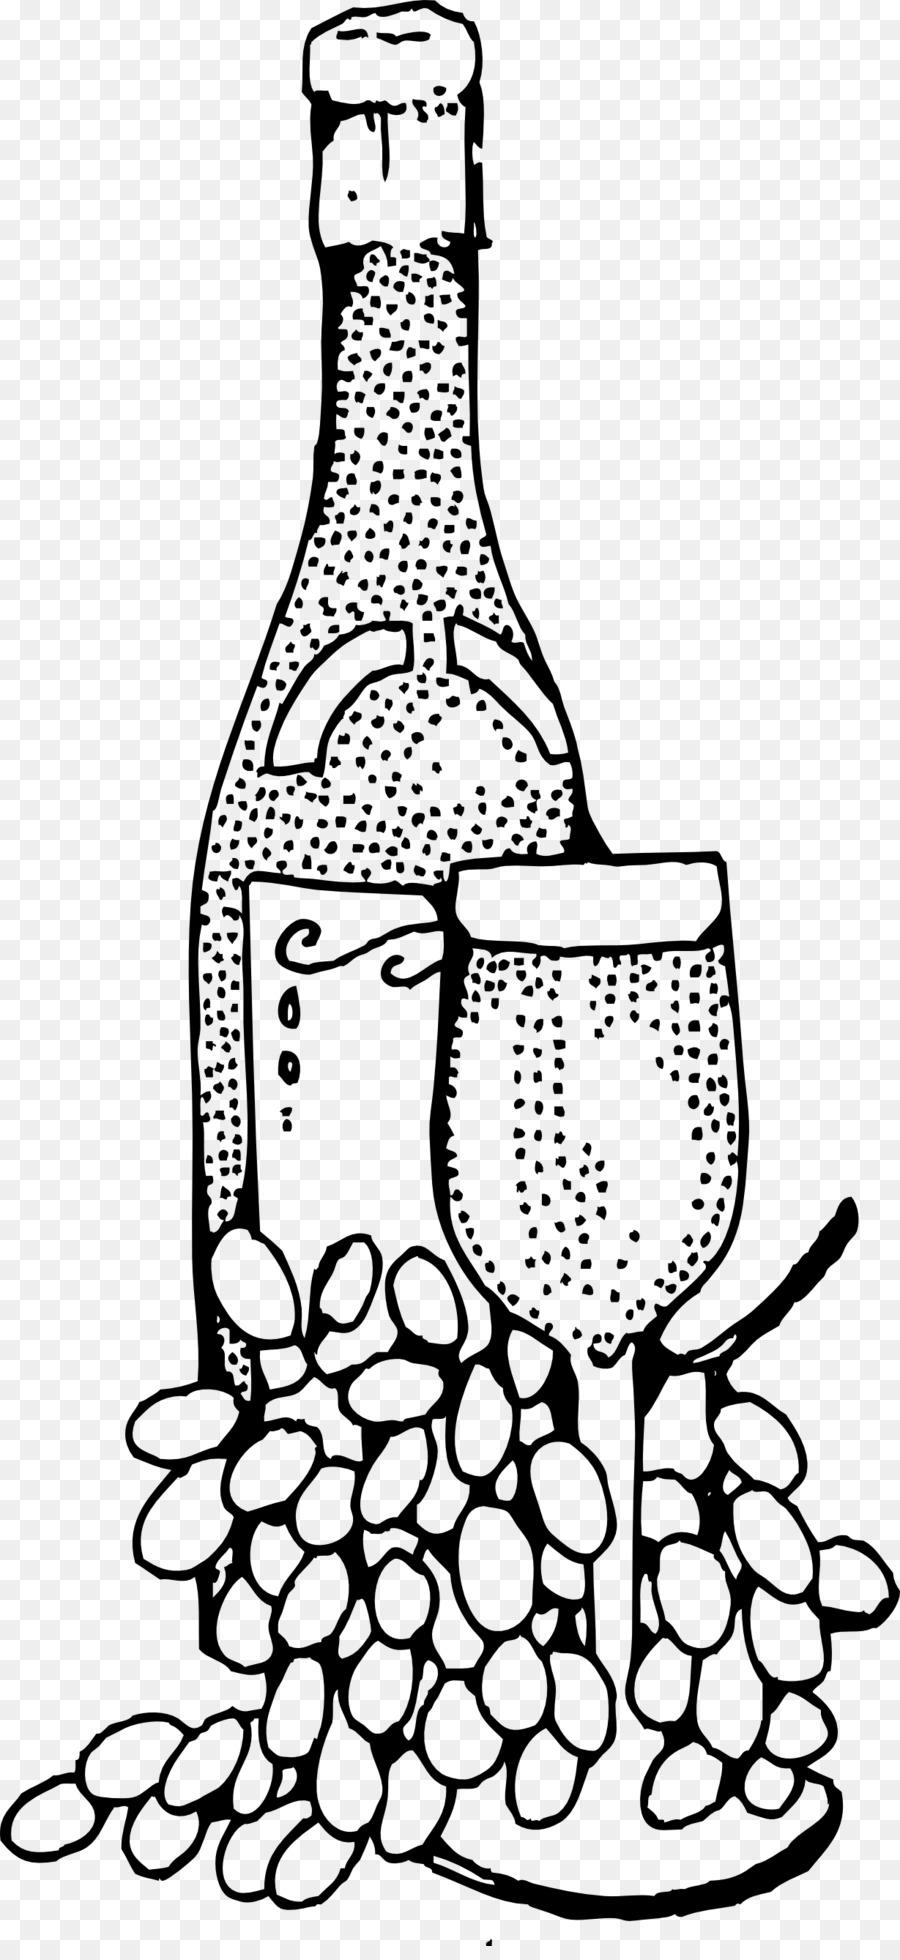 Drinking clipart vintage wine bottle. Background png download free